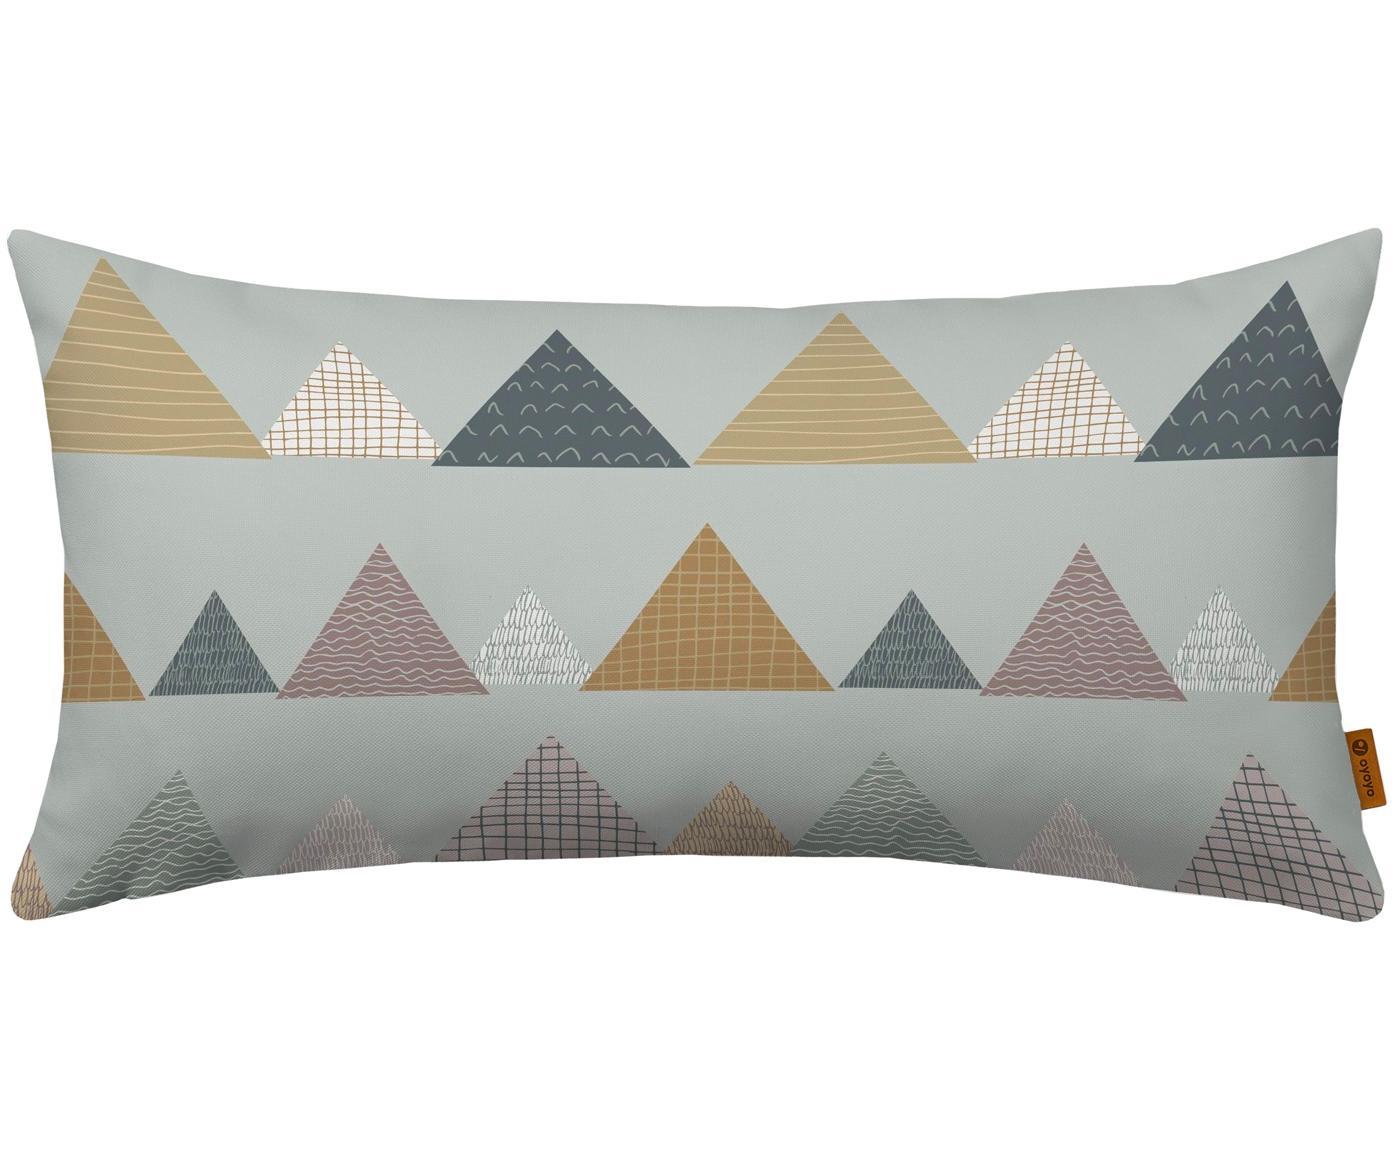 Cojín Mountains, con relleno, Funda: algodón, Gris, multicolor, An 30 x L 60 cm